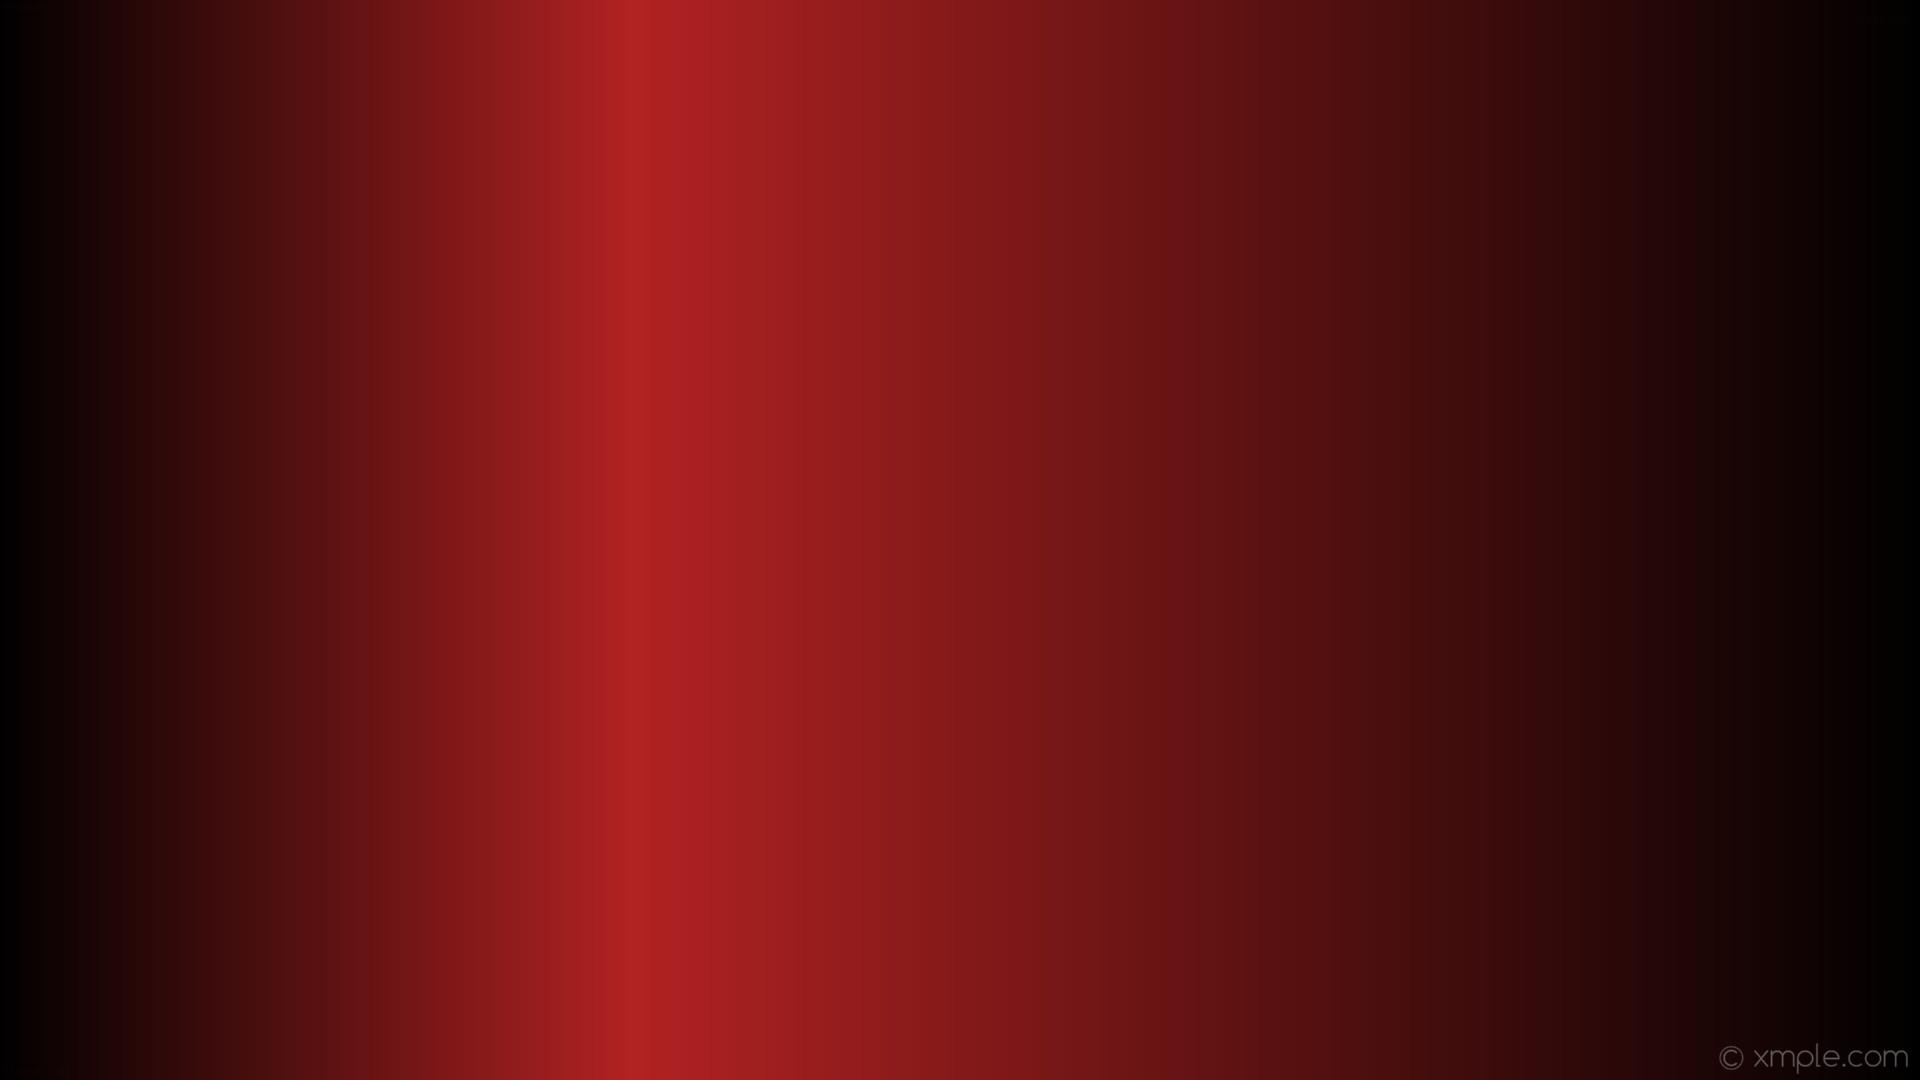 1920x1080 Wallpaper Red Gradient Linear Dark 9c270b 3a1107 0A